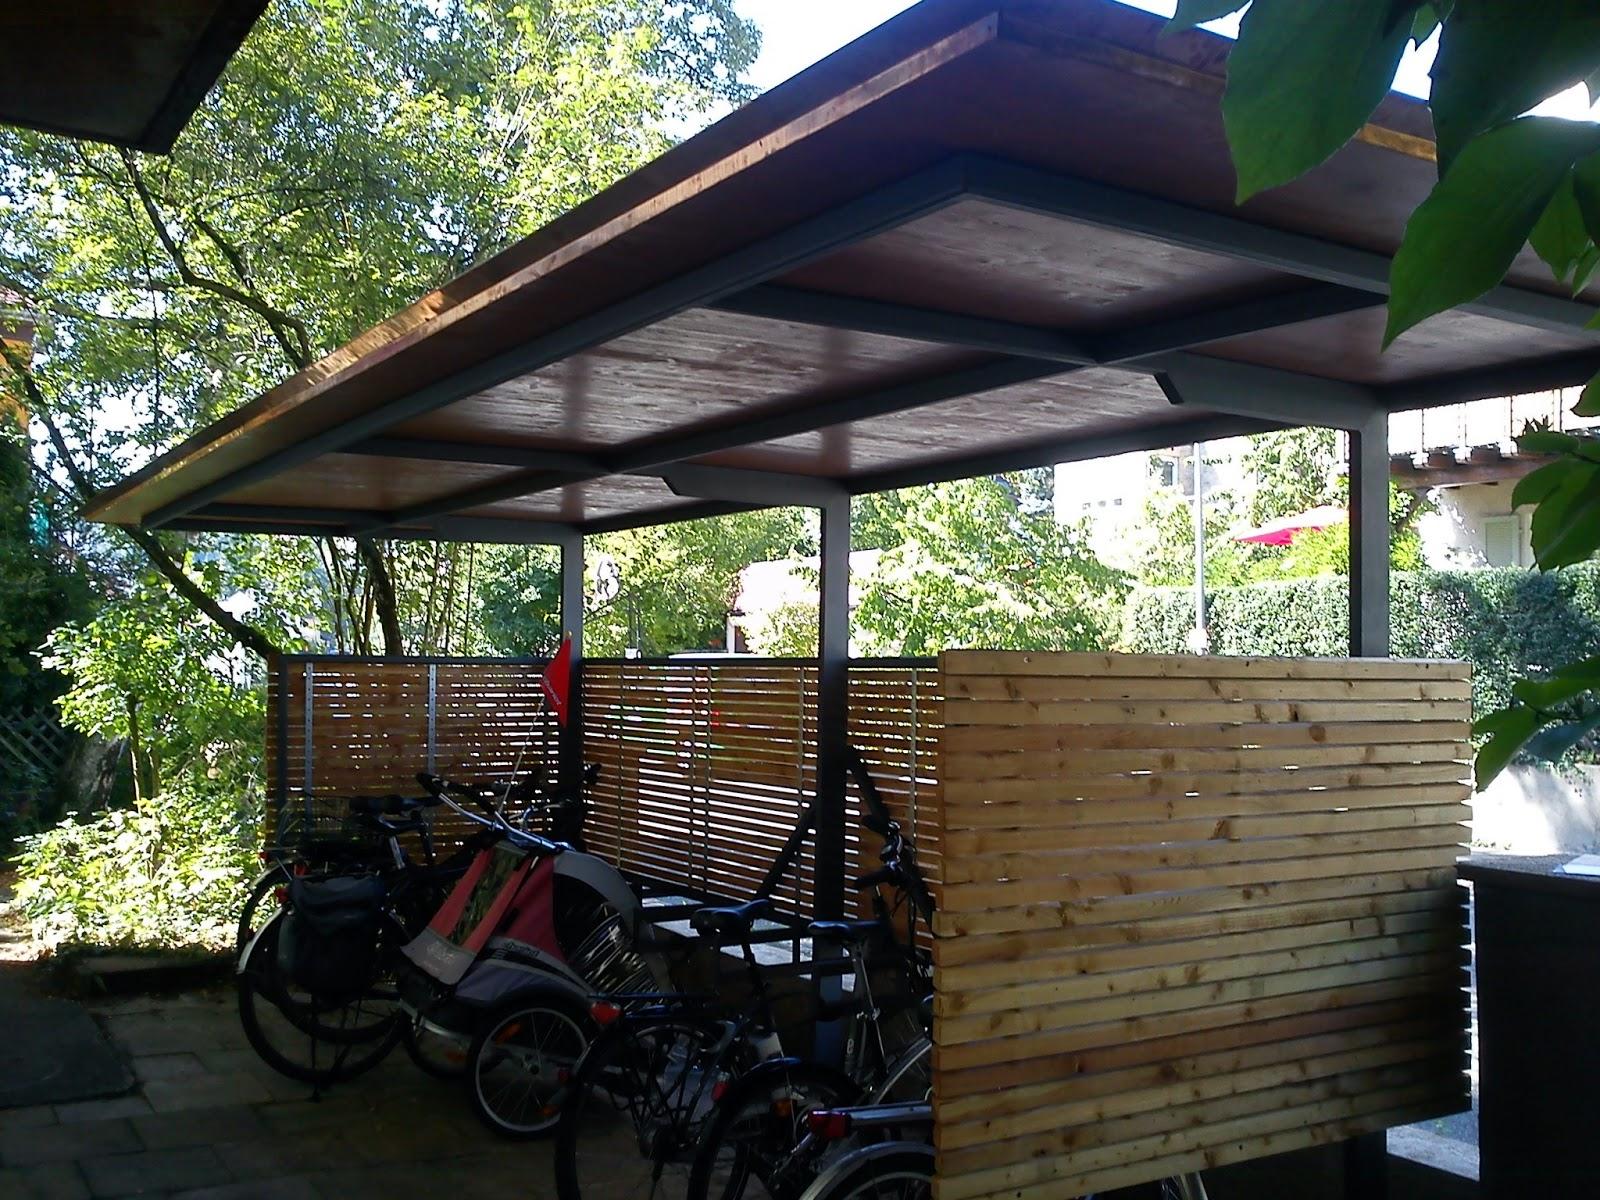 peter kiess freier architekt t bingen fahrrad berdachung. Black Bedroom Furniture Sets. Home Design Ideas